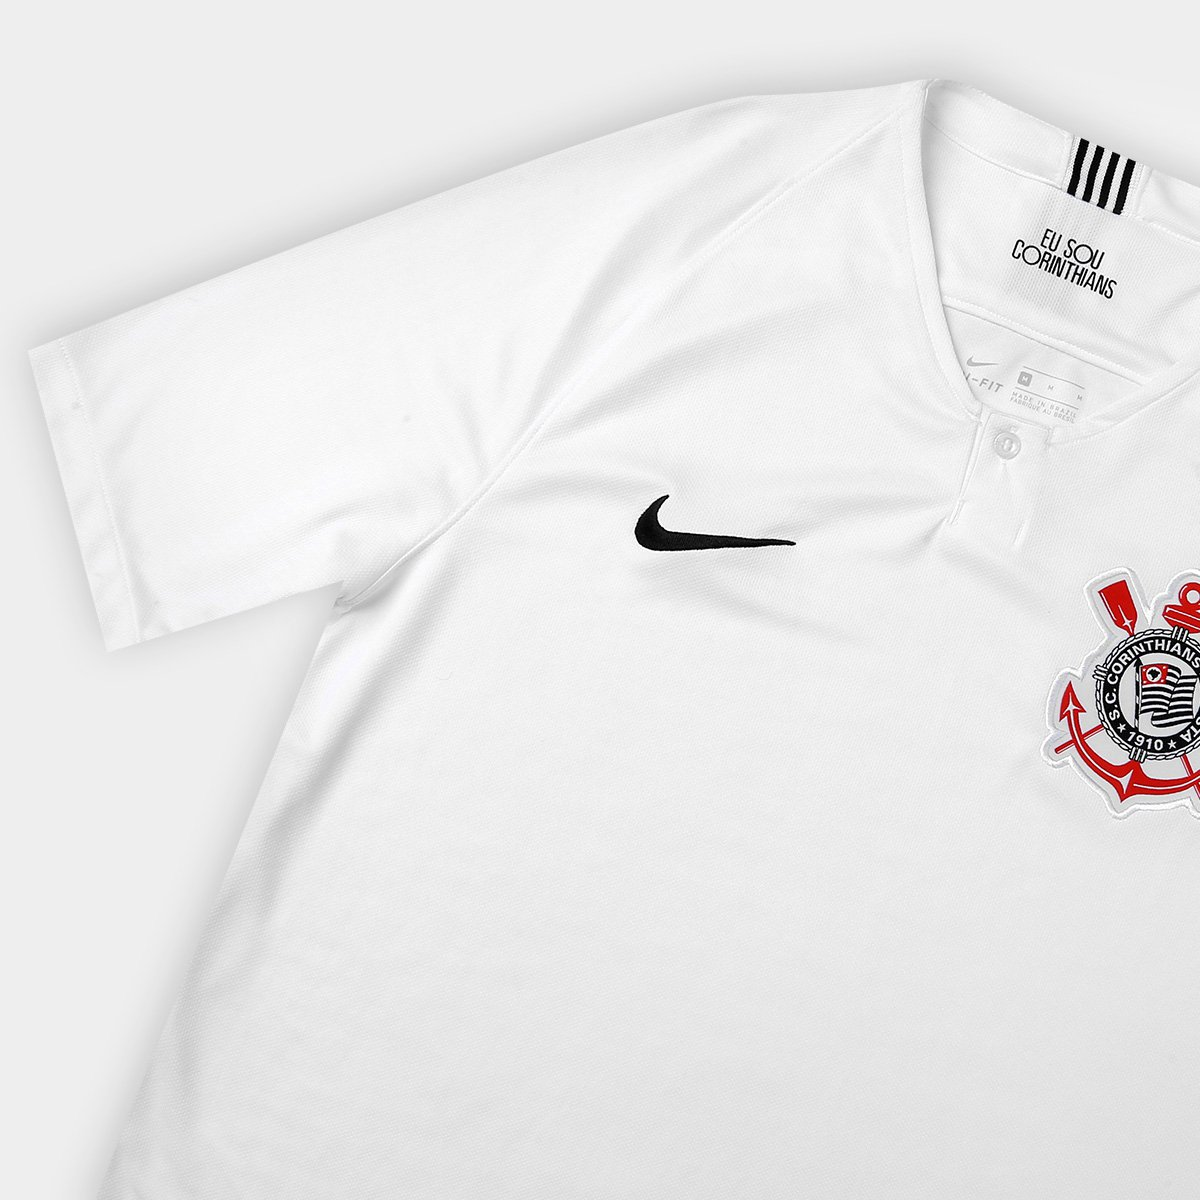 99fda7d994 Camisa Corinthians I 18 19 s n° Torcedor Nike Masculina - Branco e ...